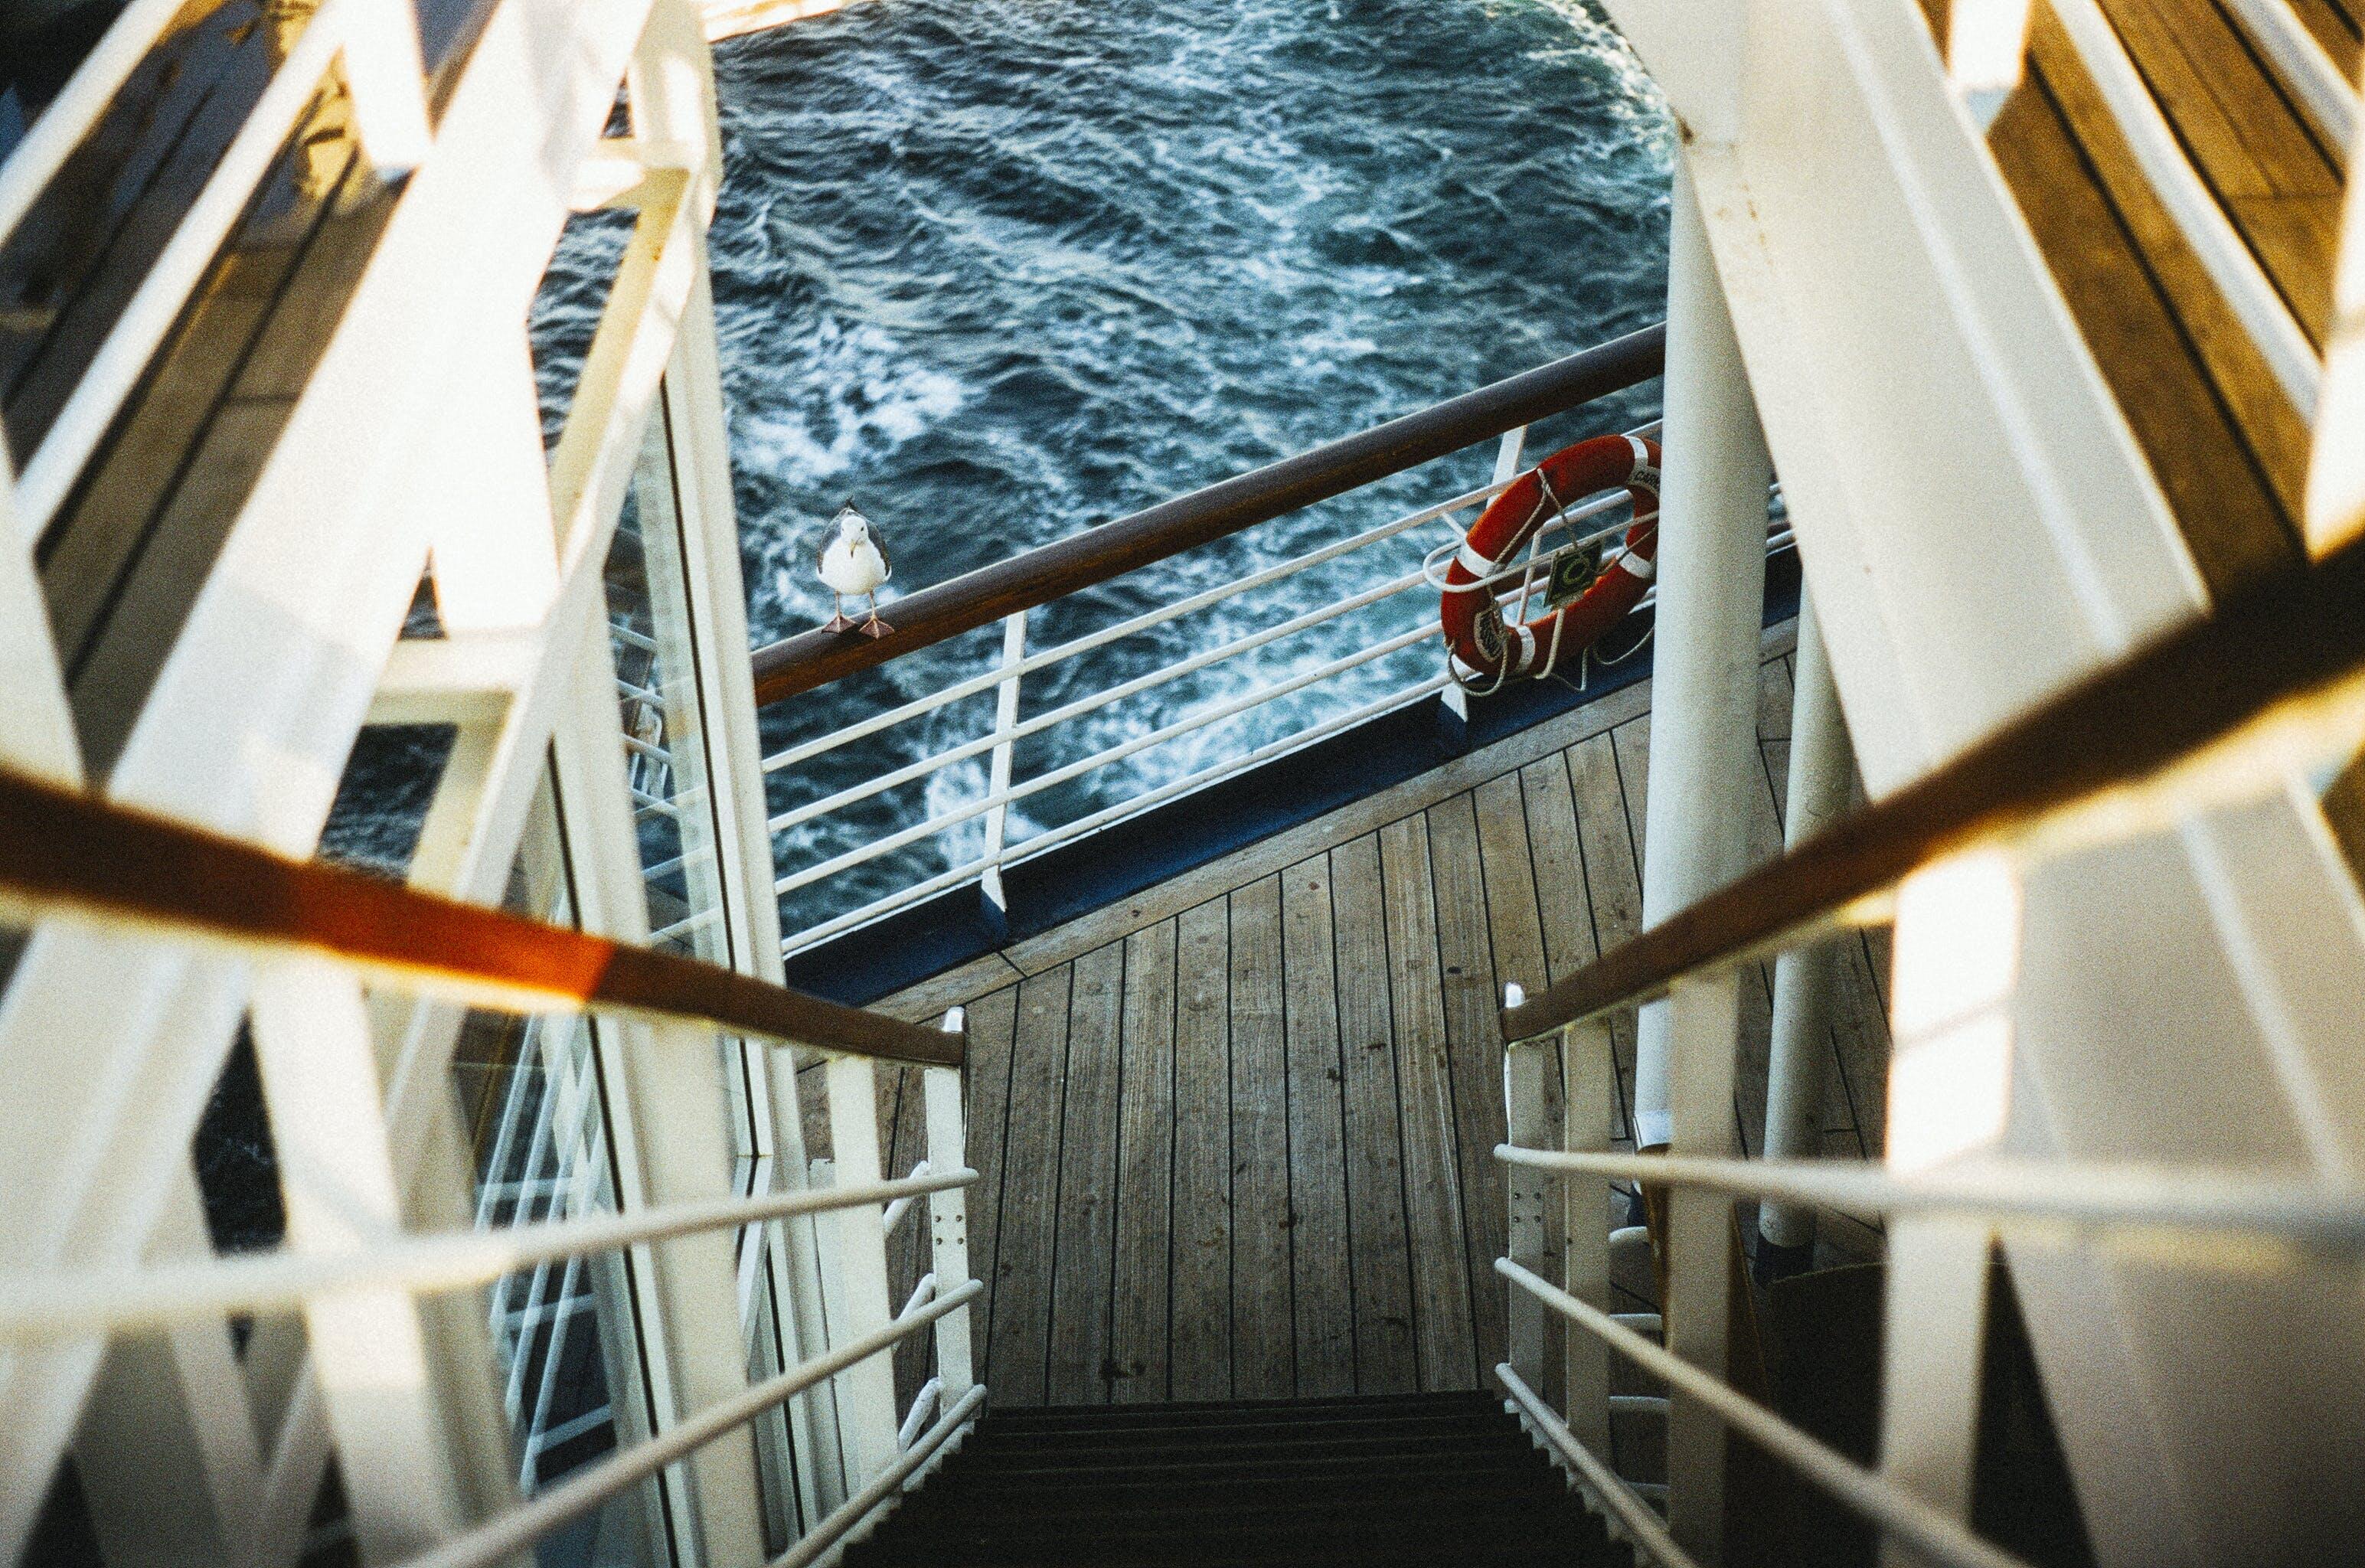 Boat on Ocean